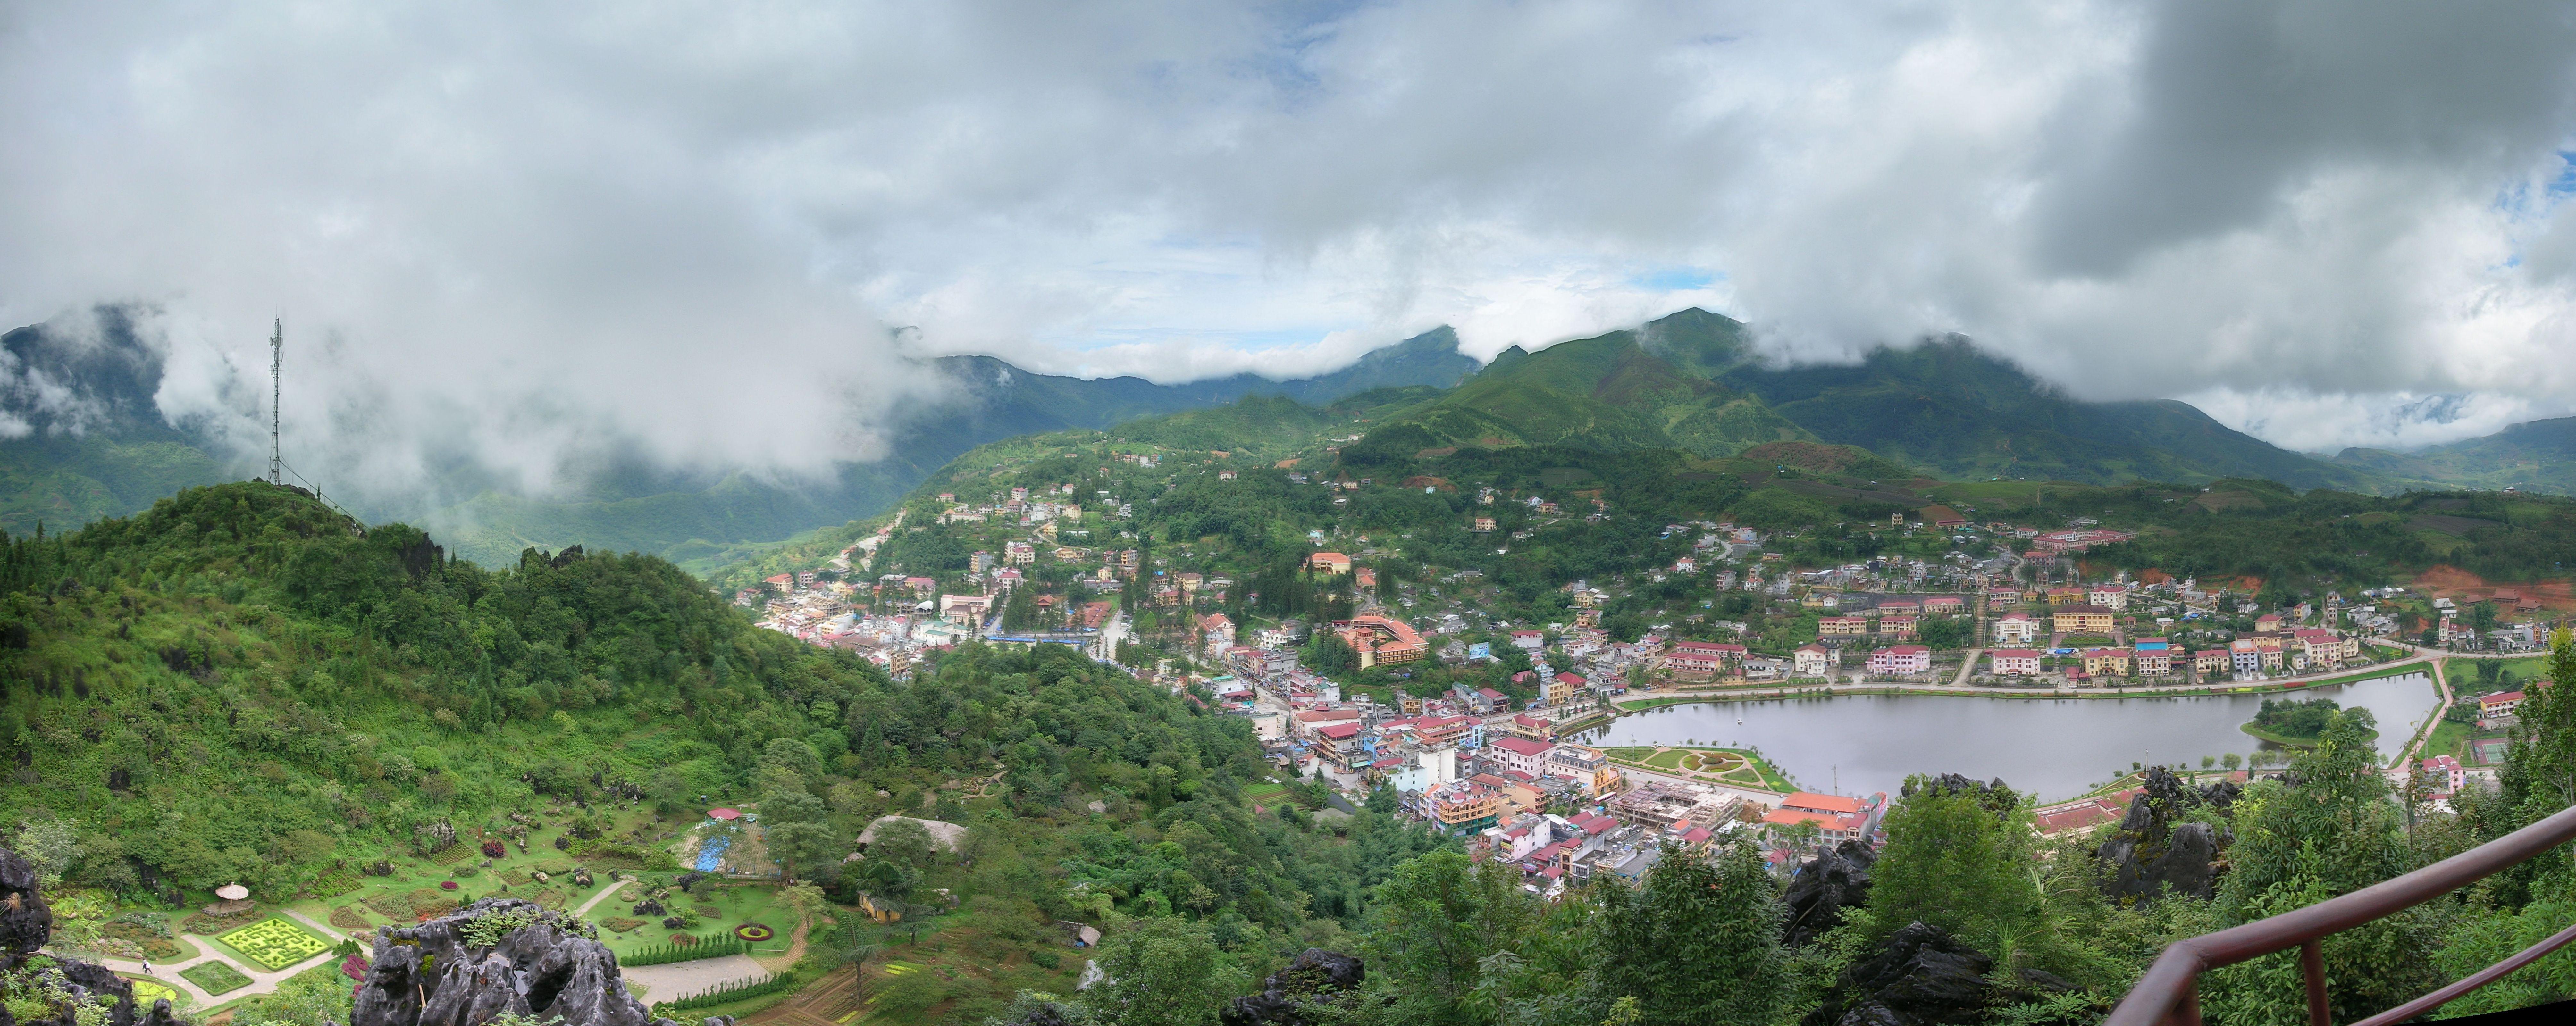 Tập tin:Sapa vu du mont Ham Rong.jpg